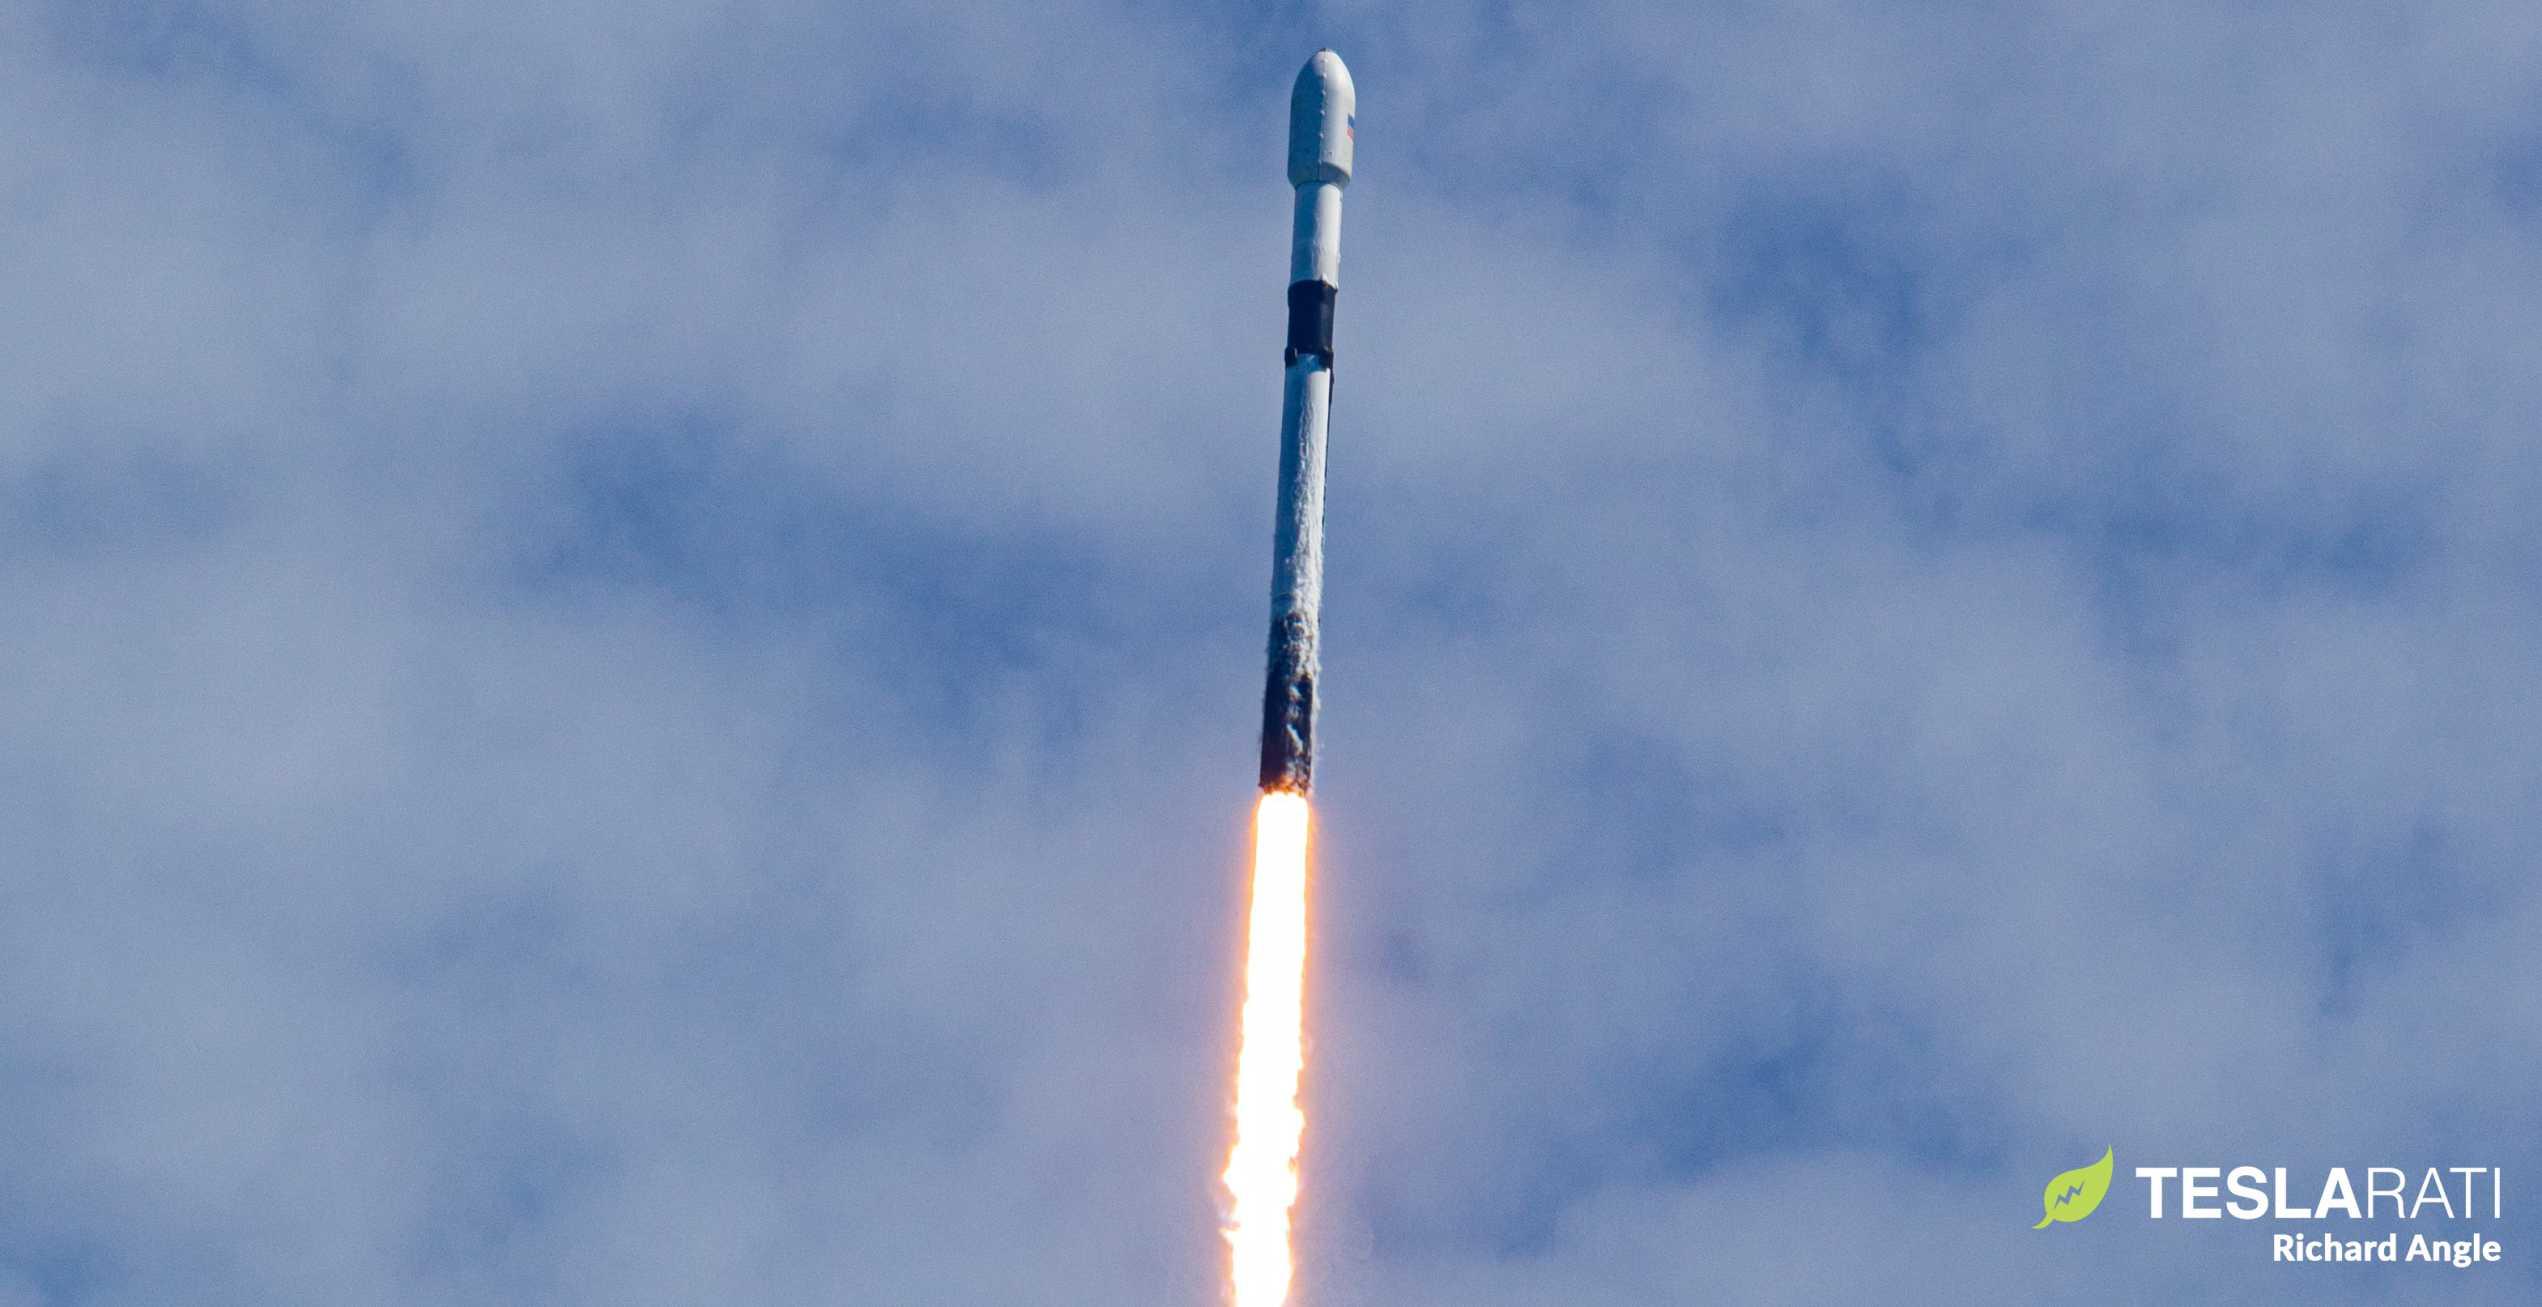 Starlink-10 SkySat Falcon 9 B1049 081820 (Richard Angle) launch 4 (c)